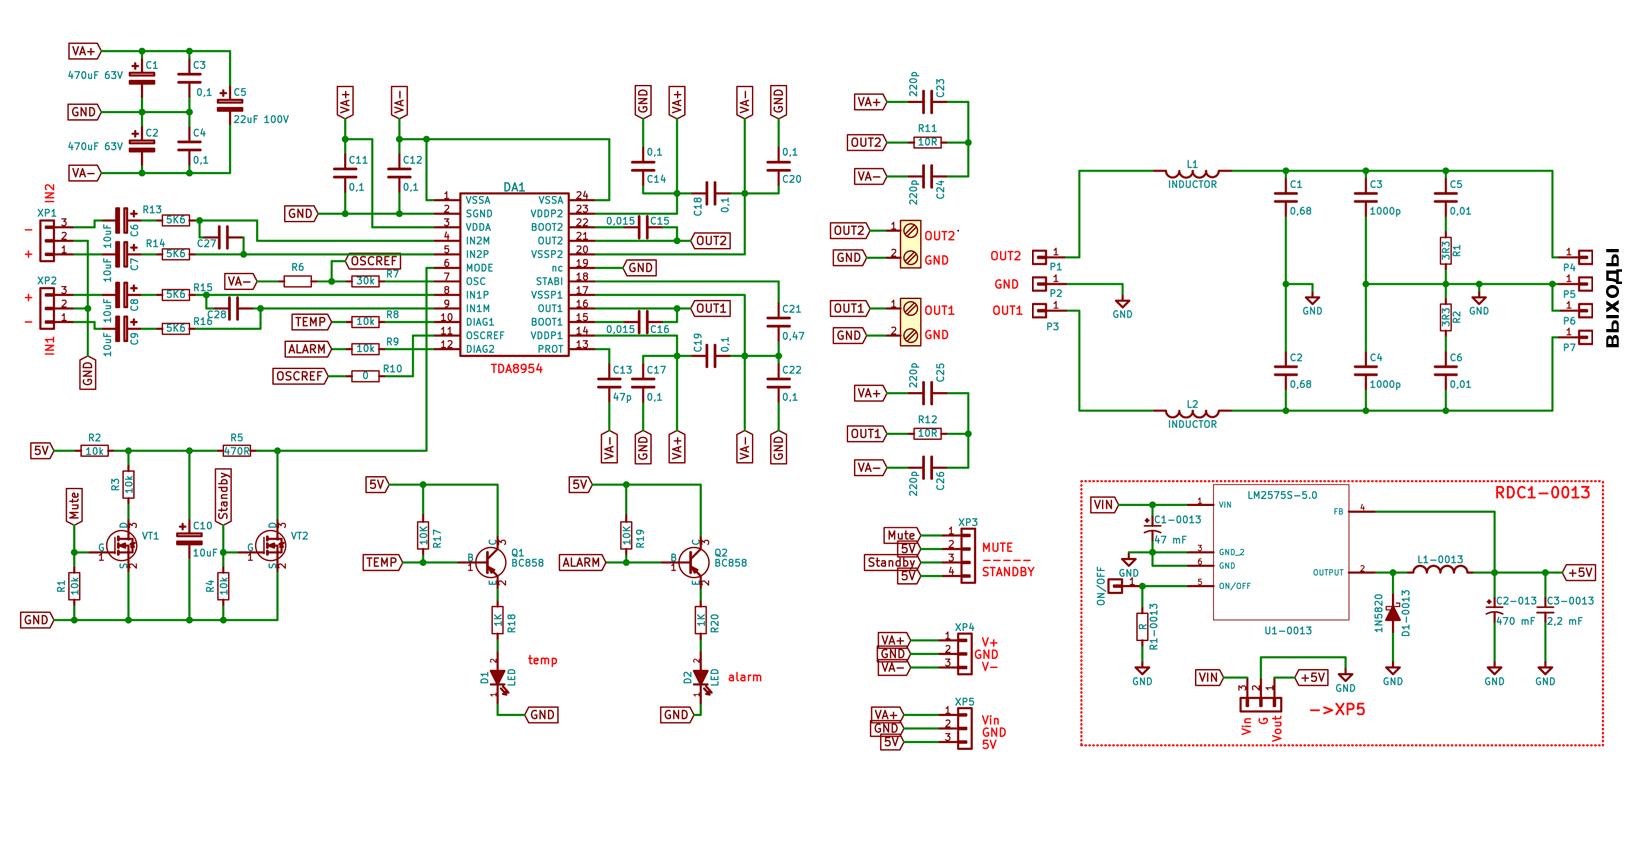 Ta8275hq схема усилителя - подробная информация